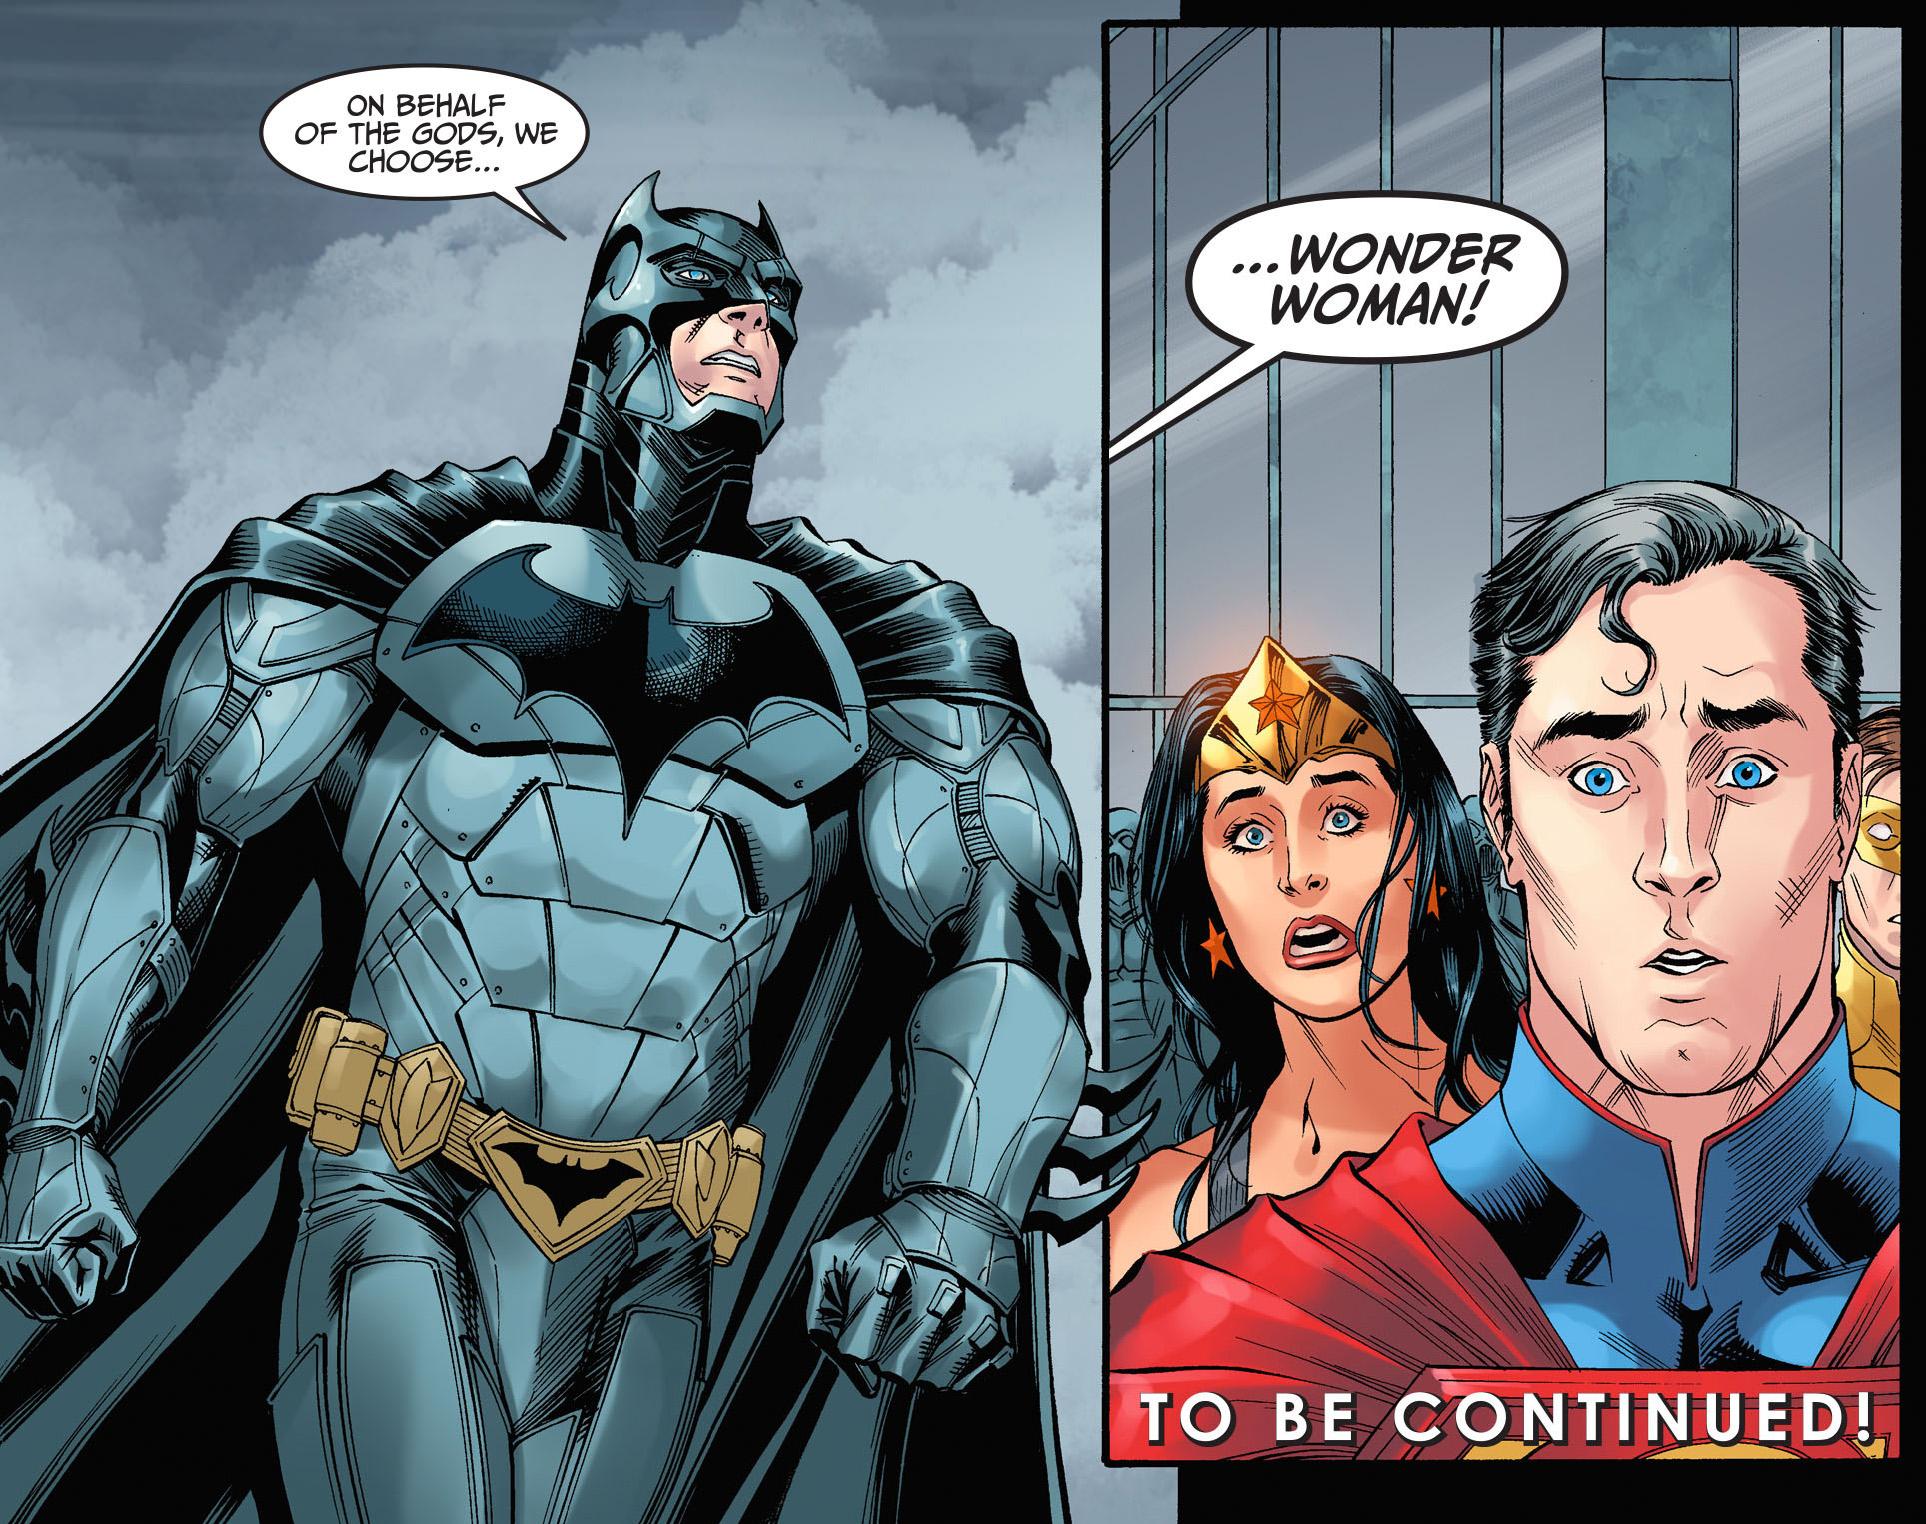 Wonder Woman Chooses Judgement By Combat